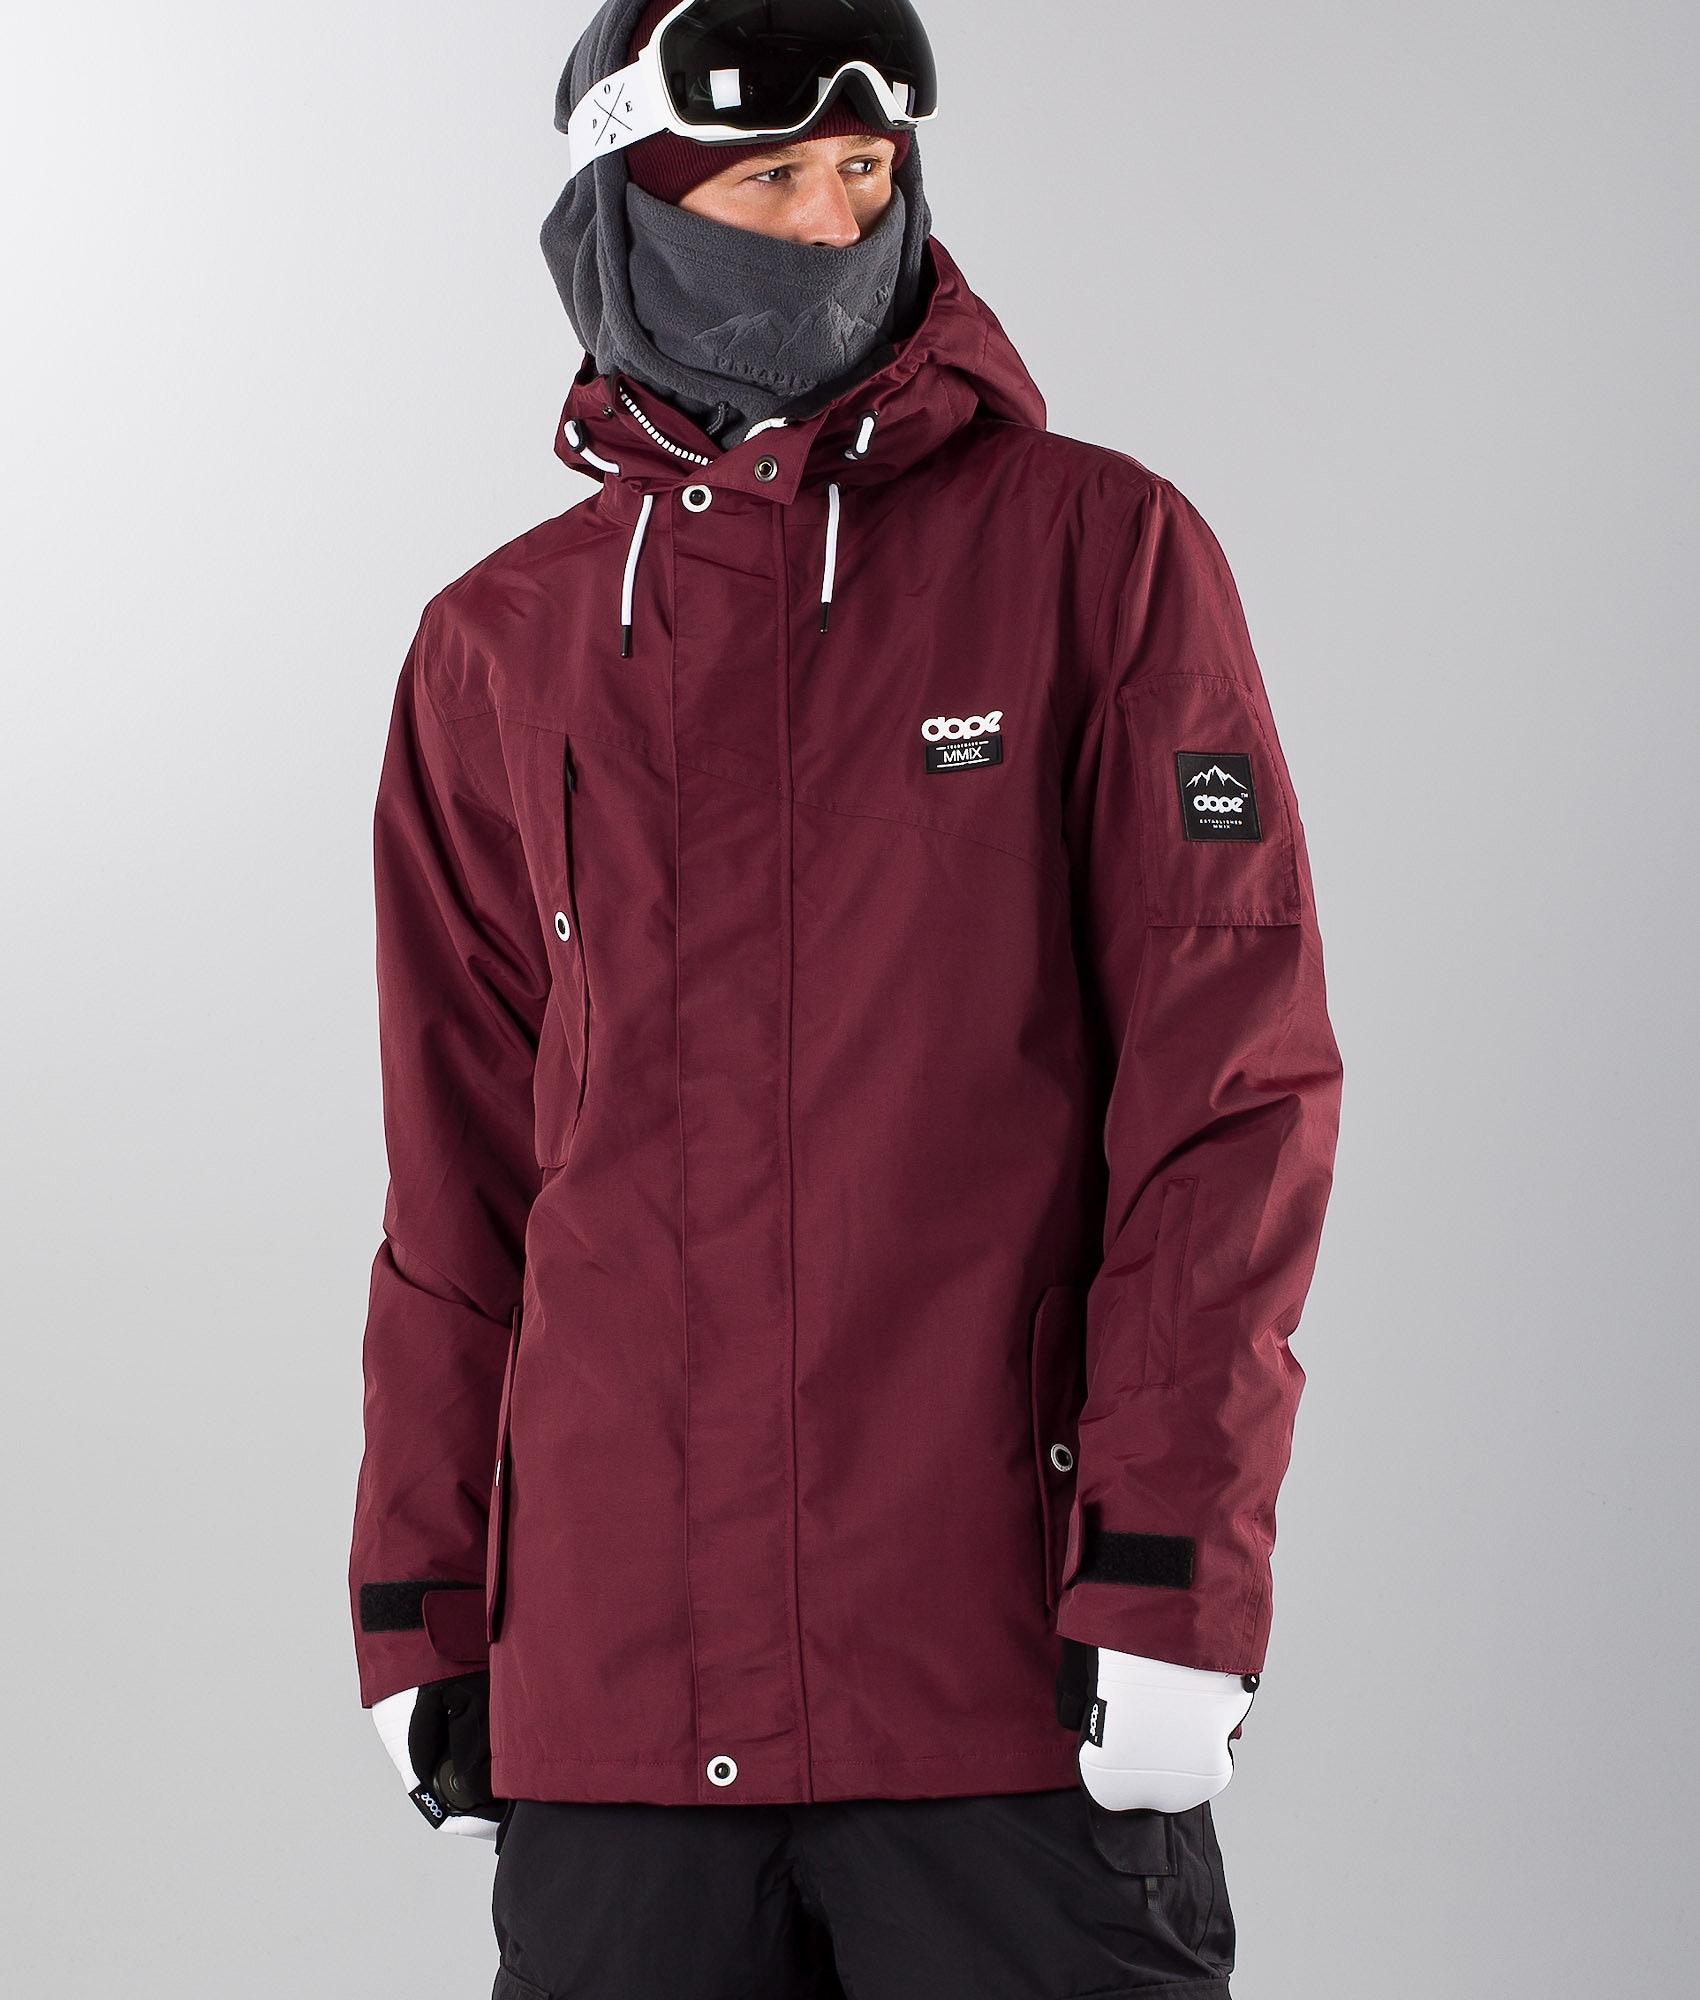 5e7cbb149 Dope Adept Snowboard Jacket Burgundy